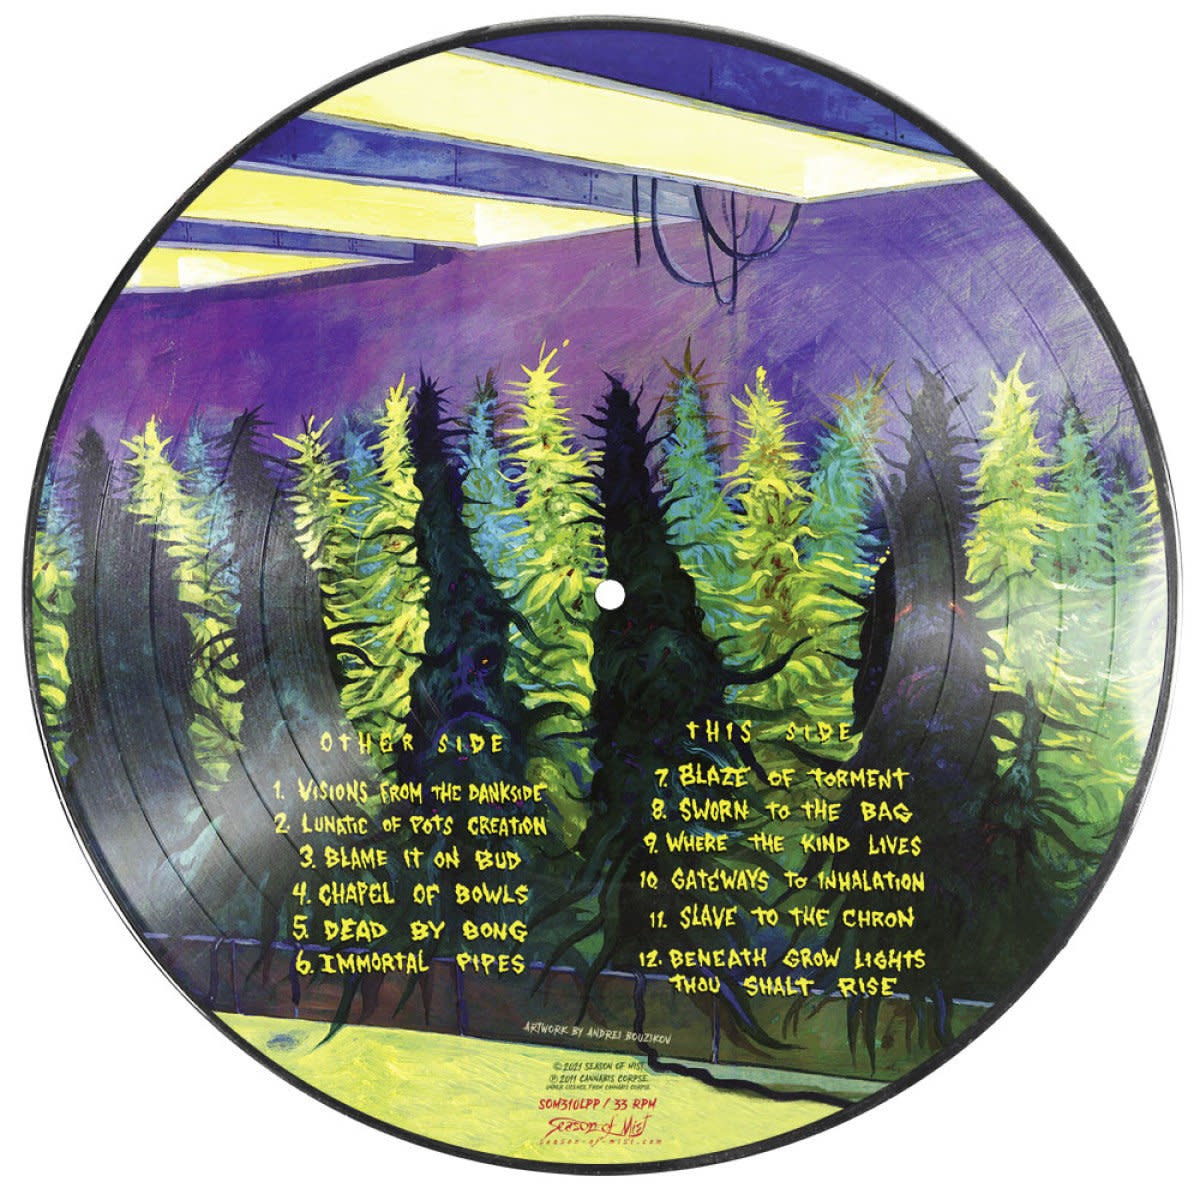 Metal Cannabis Corpse - Beneath Grow Lights Thou Shalt Rise (Picture Disc)